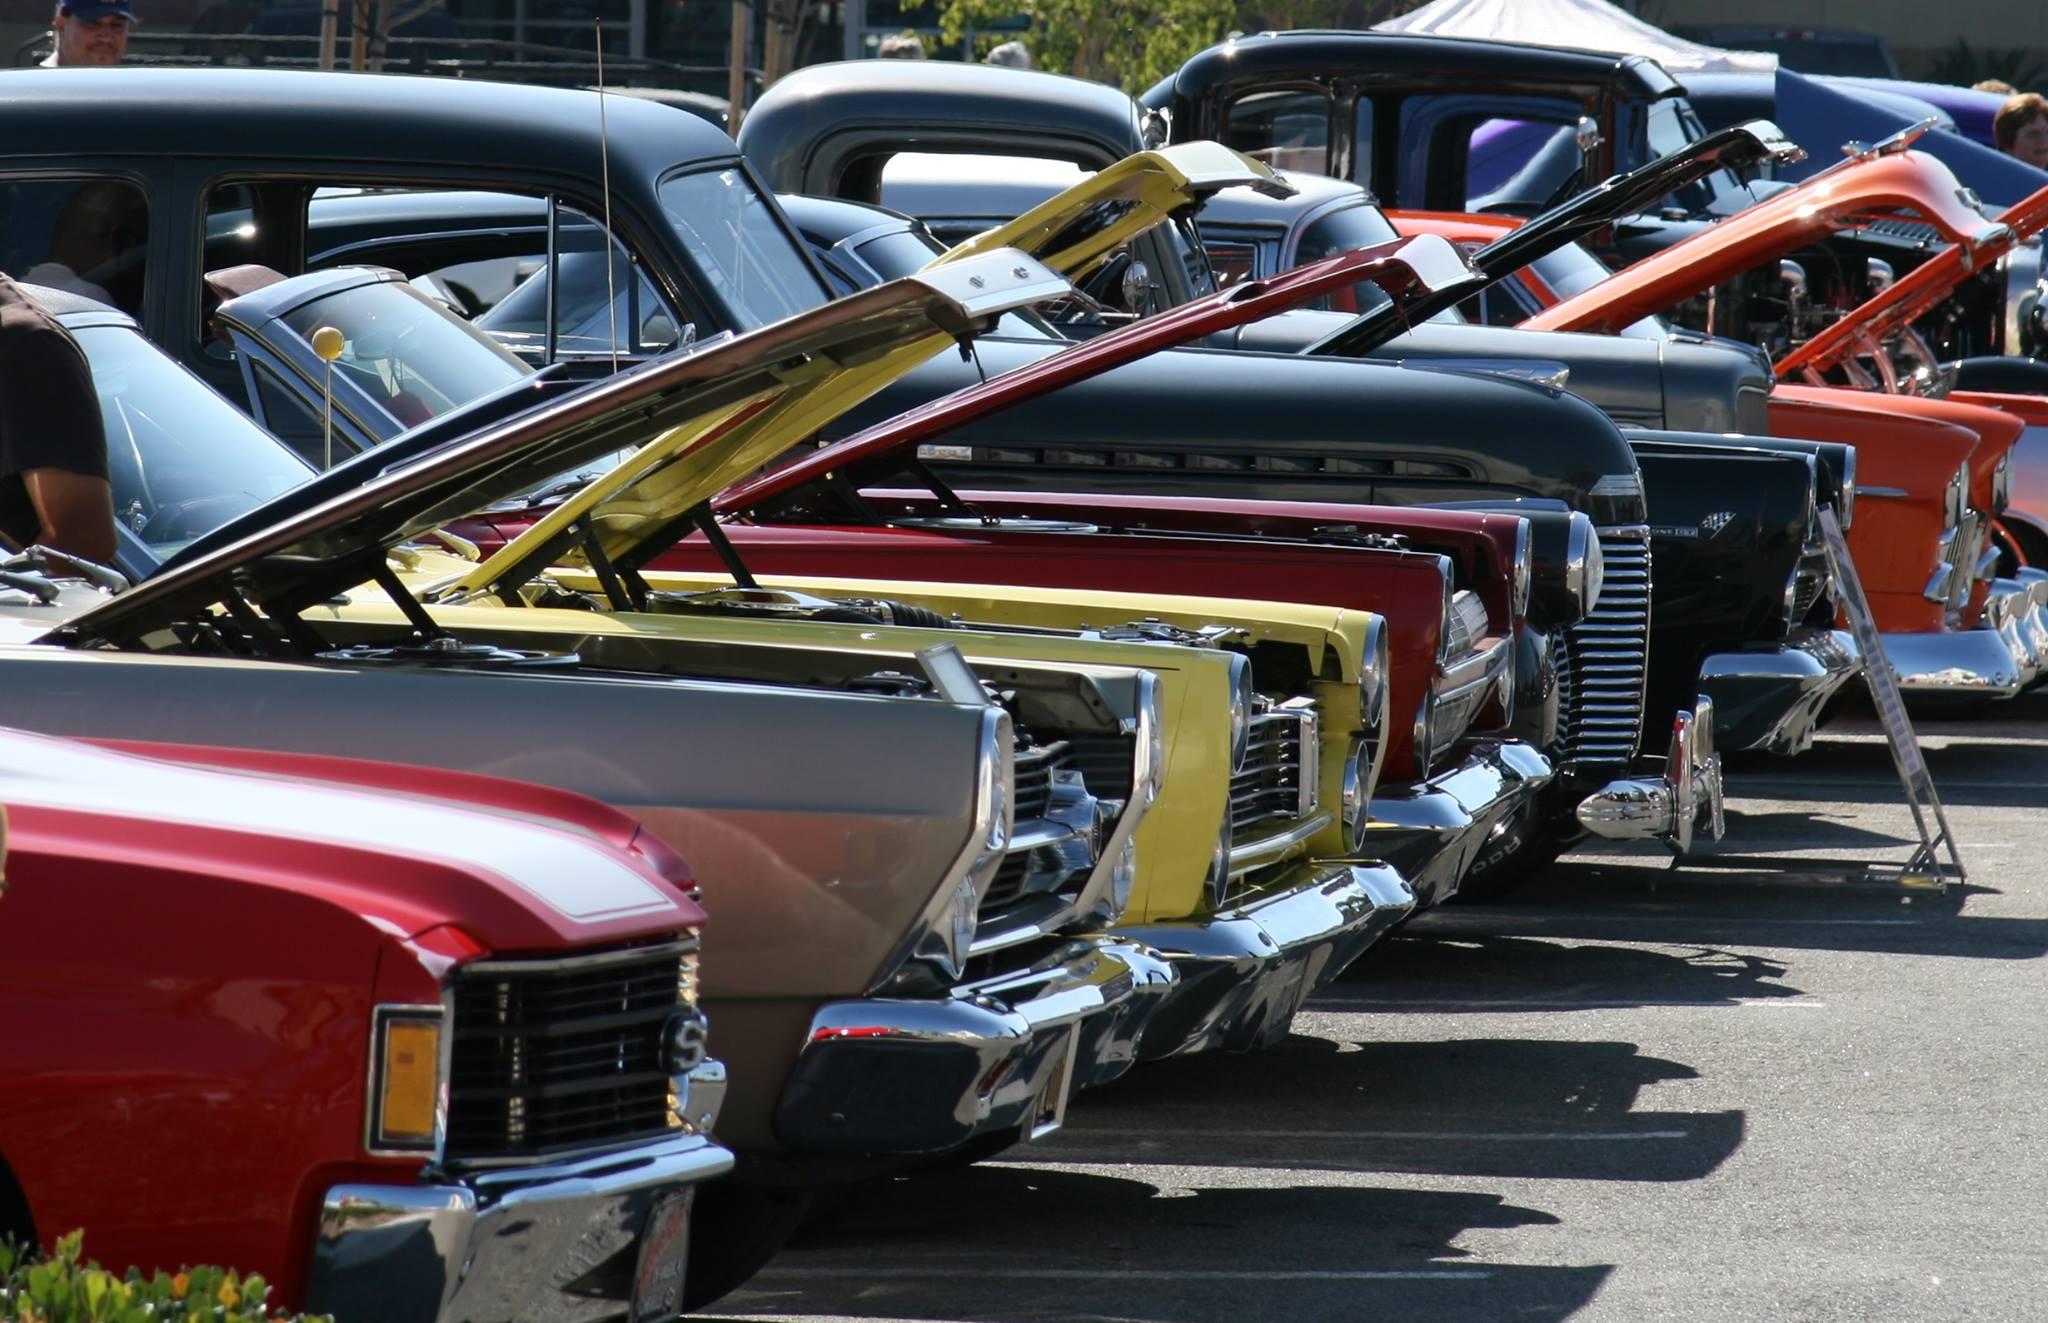 Festival Of The Lakes Hot Rod Custom Car Show The Pavilion At - Pavilions car show